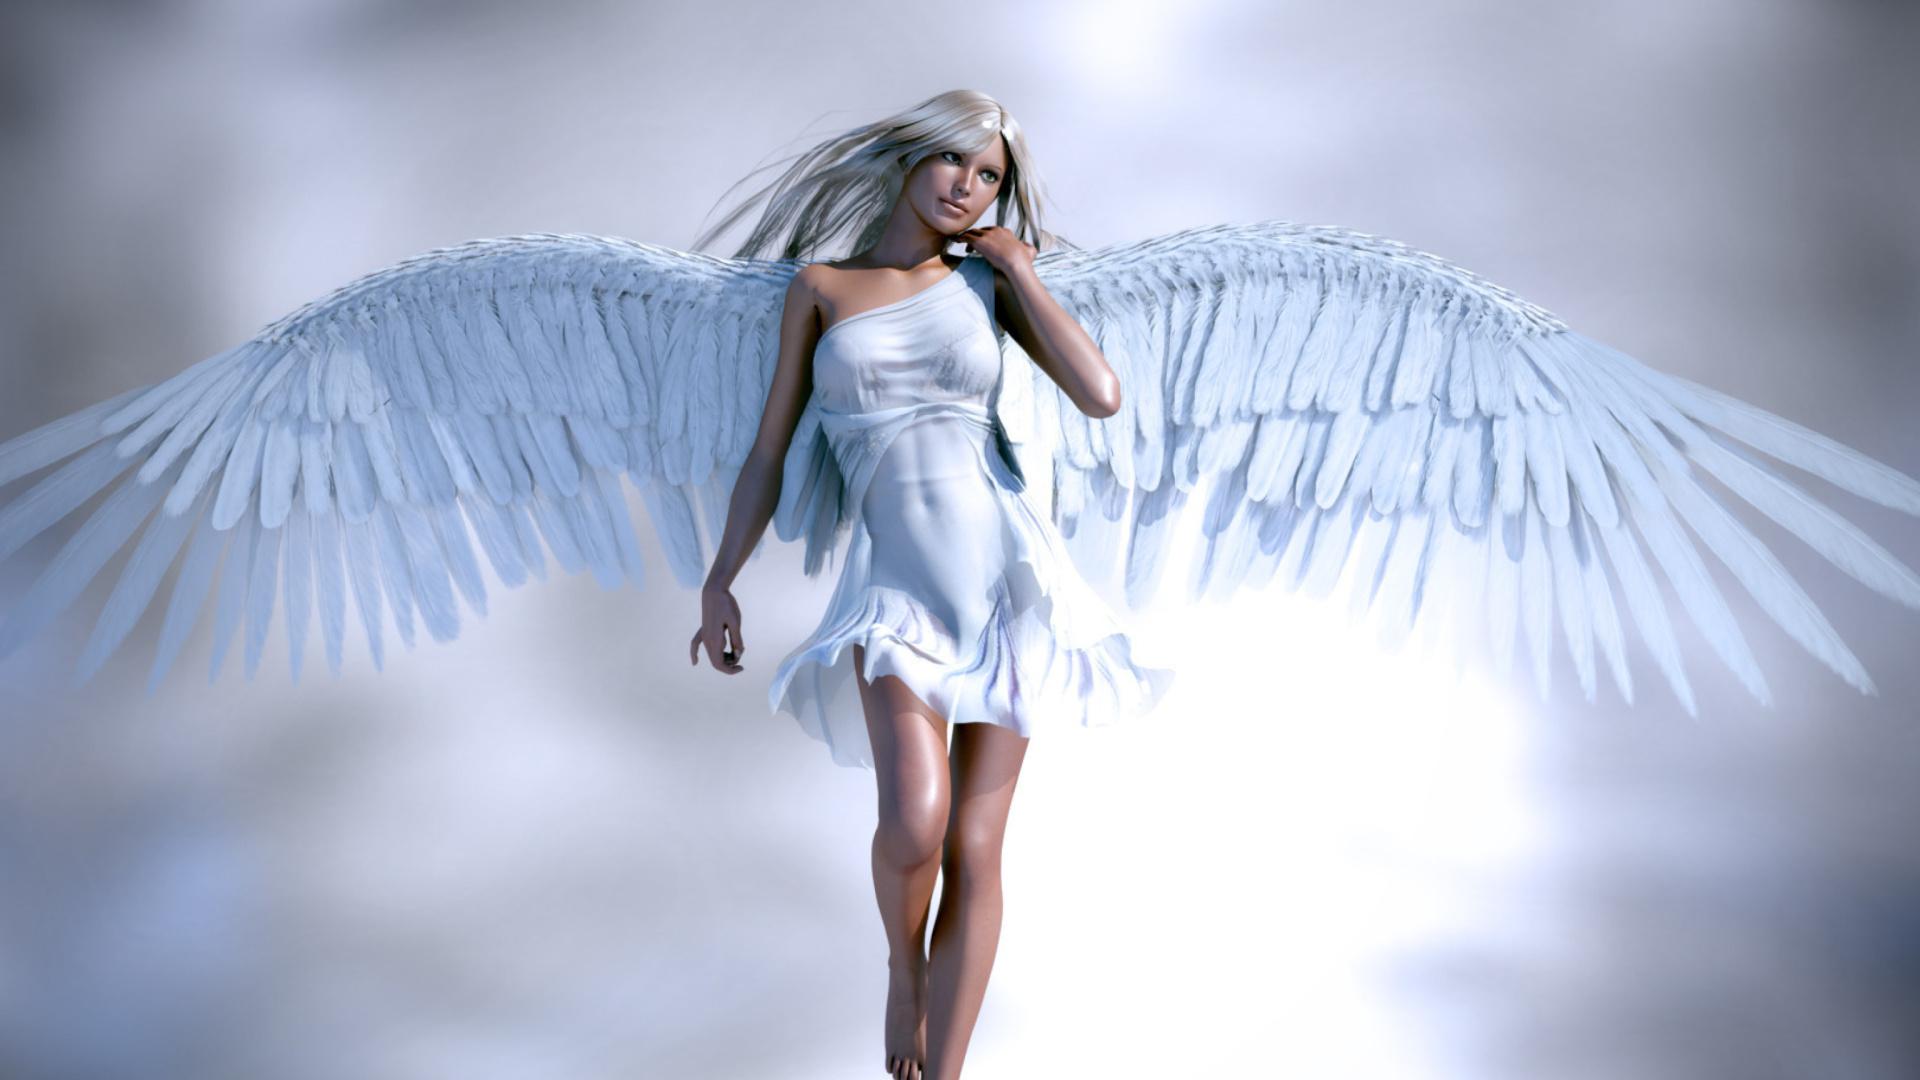 Angels Wallpapers For Desktop 3d: Angels Screensavers And Wallpaper